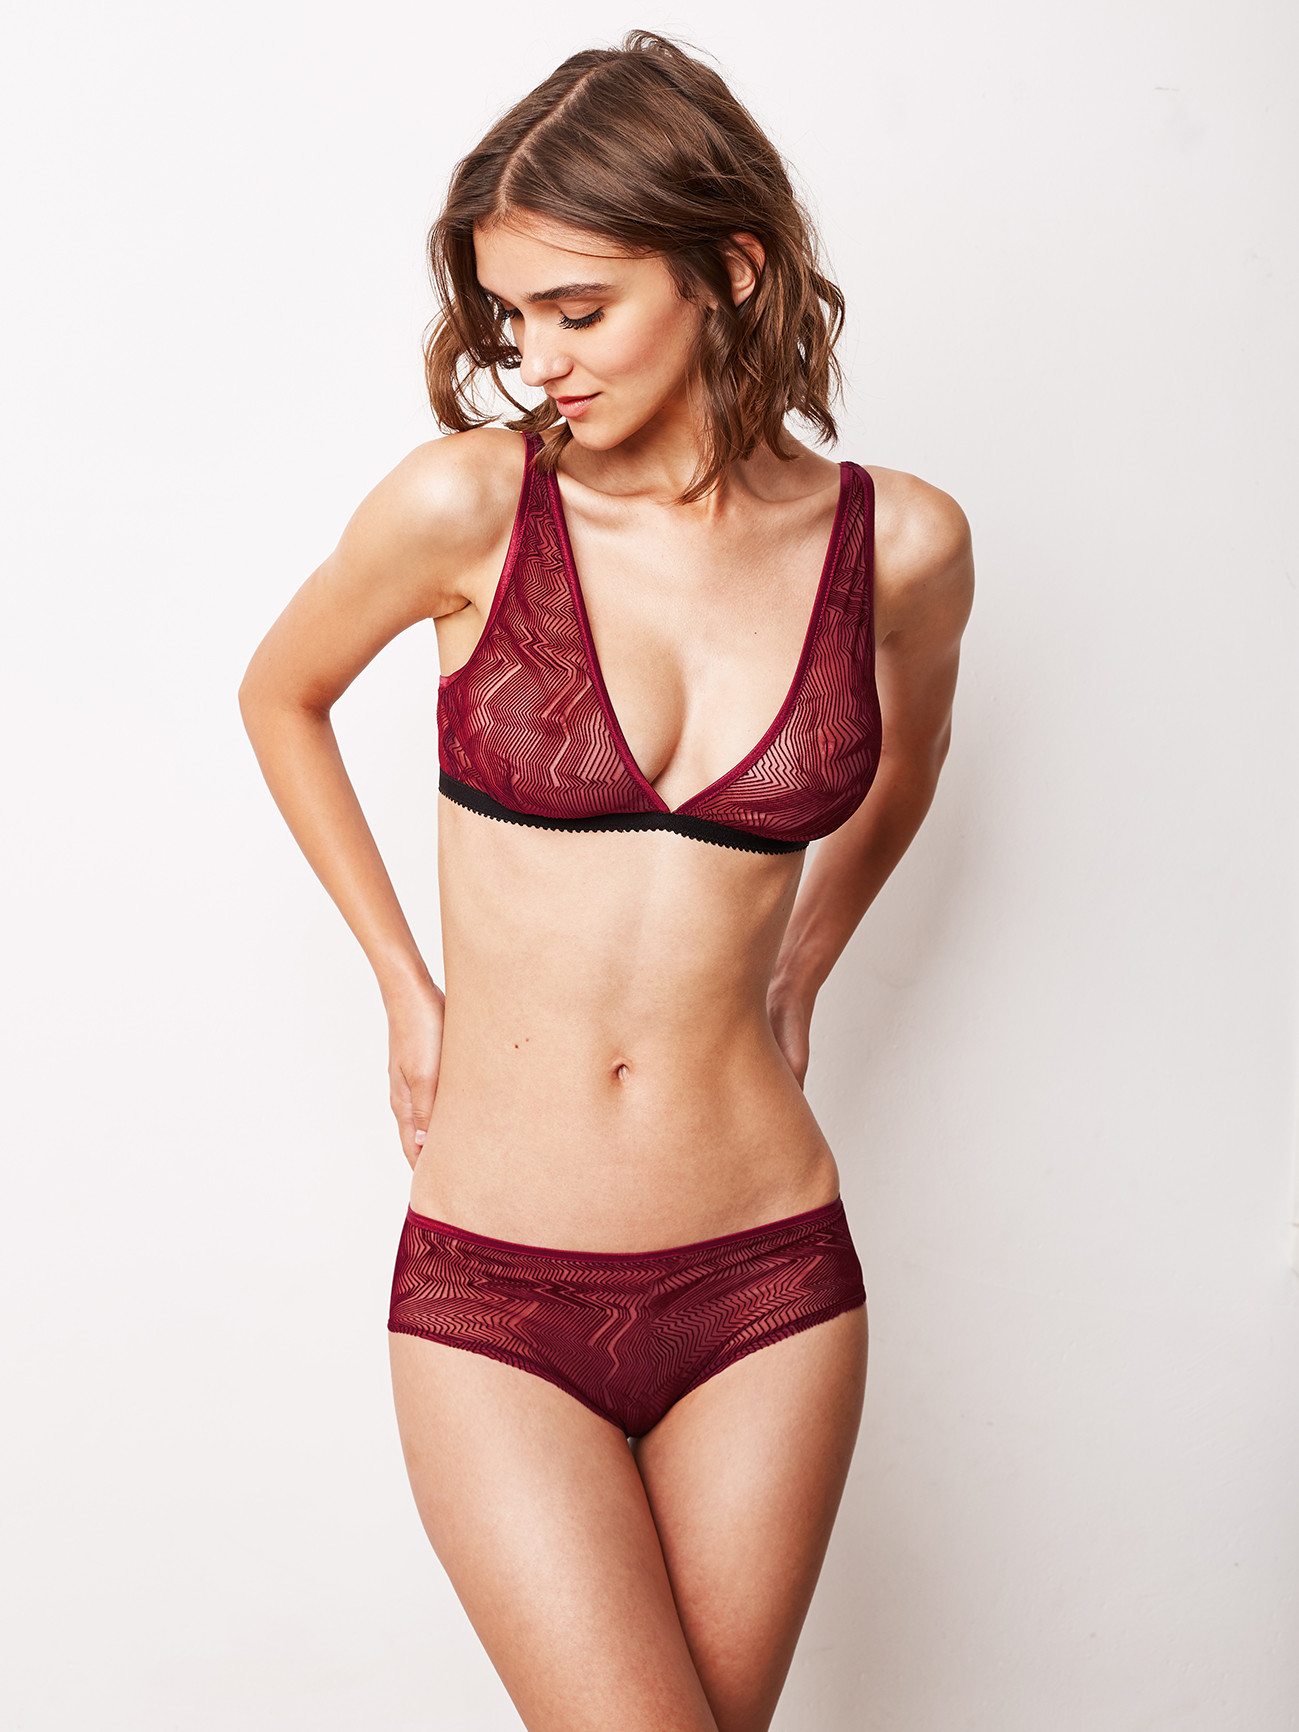 Instagram Paula Bulczynska nude (17 photos), Boobs